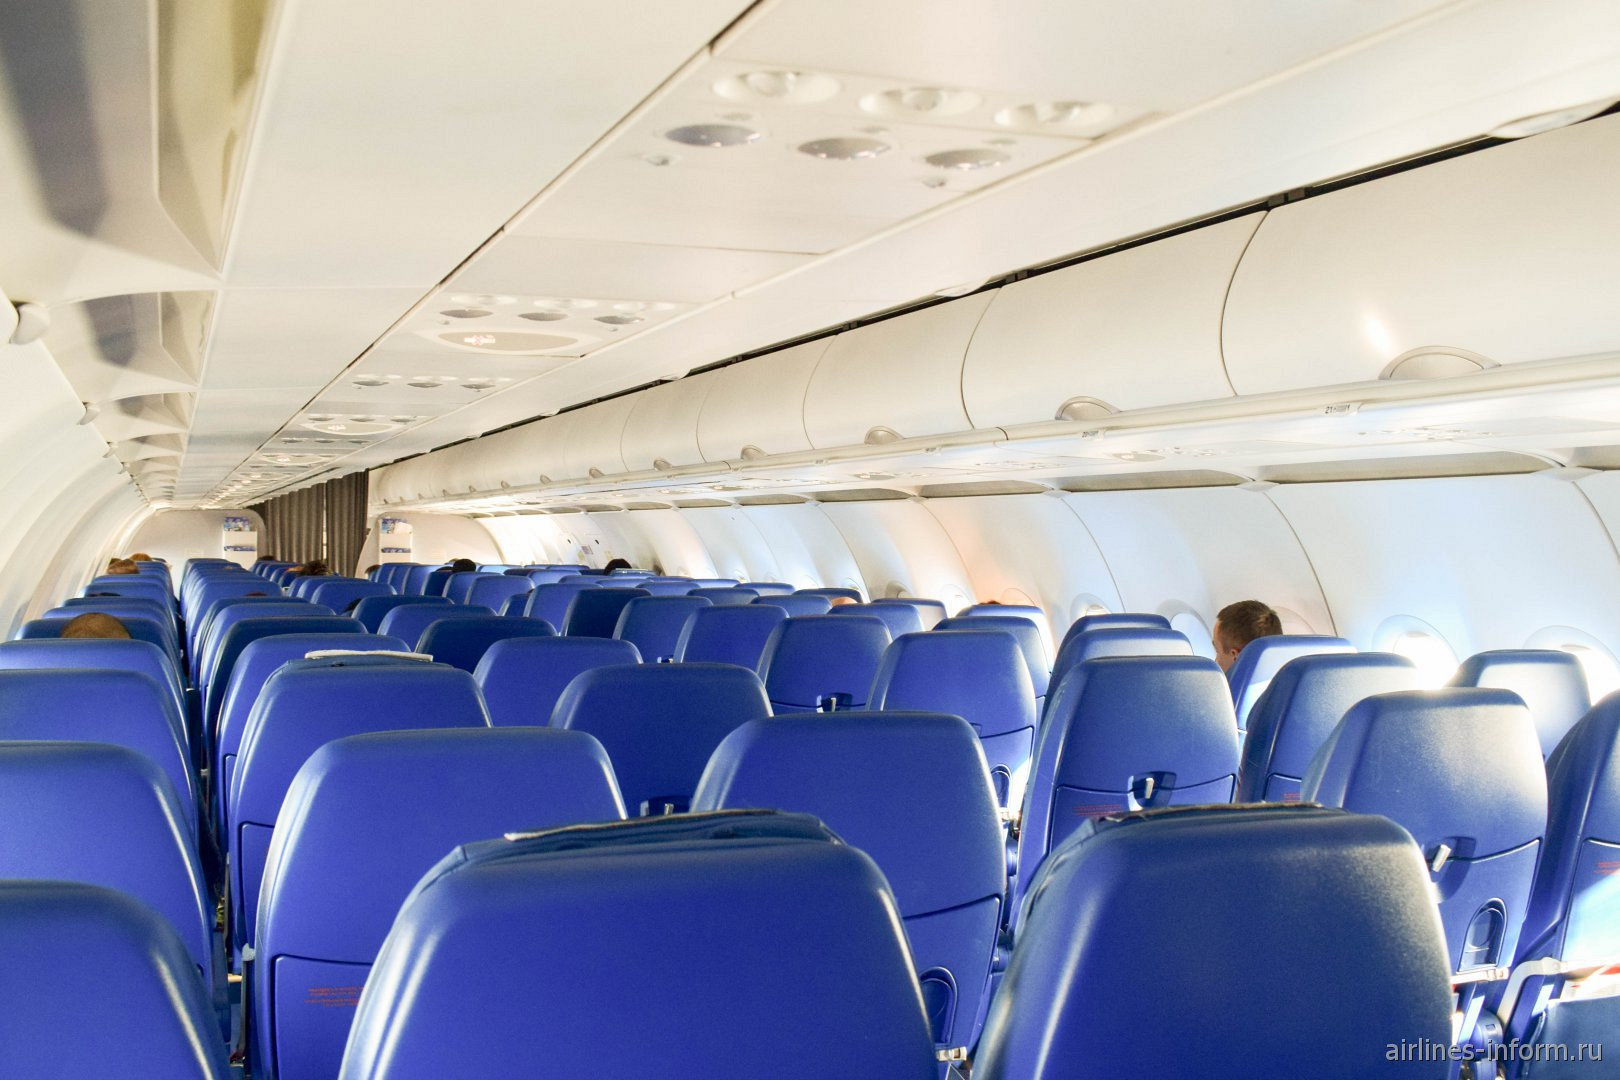 Пассажирский салон самолета Airbus A320 авиакомпании